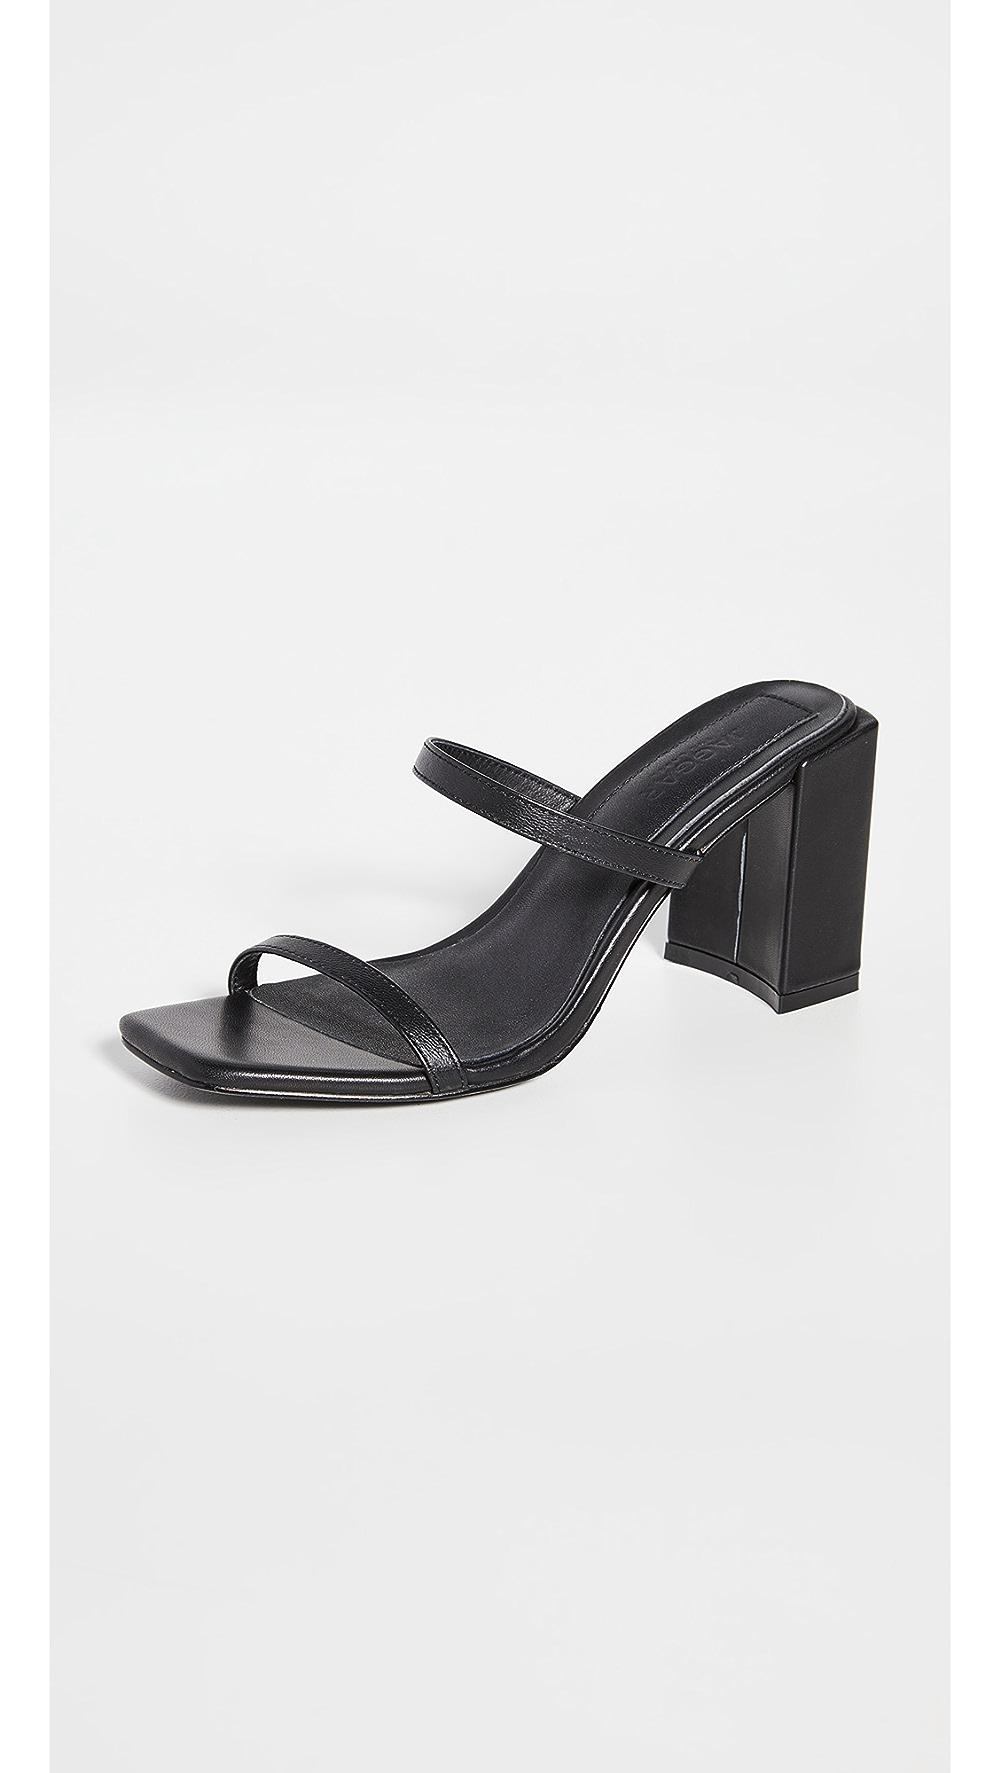 Confident Jaggar - Square Heel Sandals Discounts Price